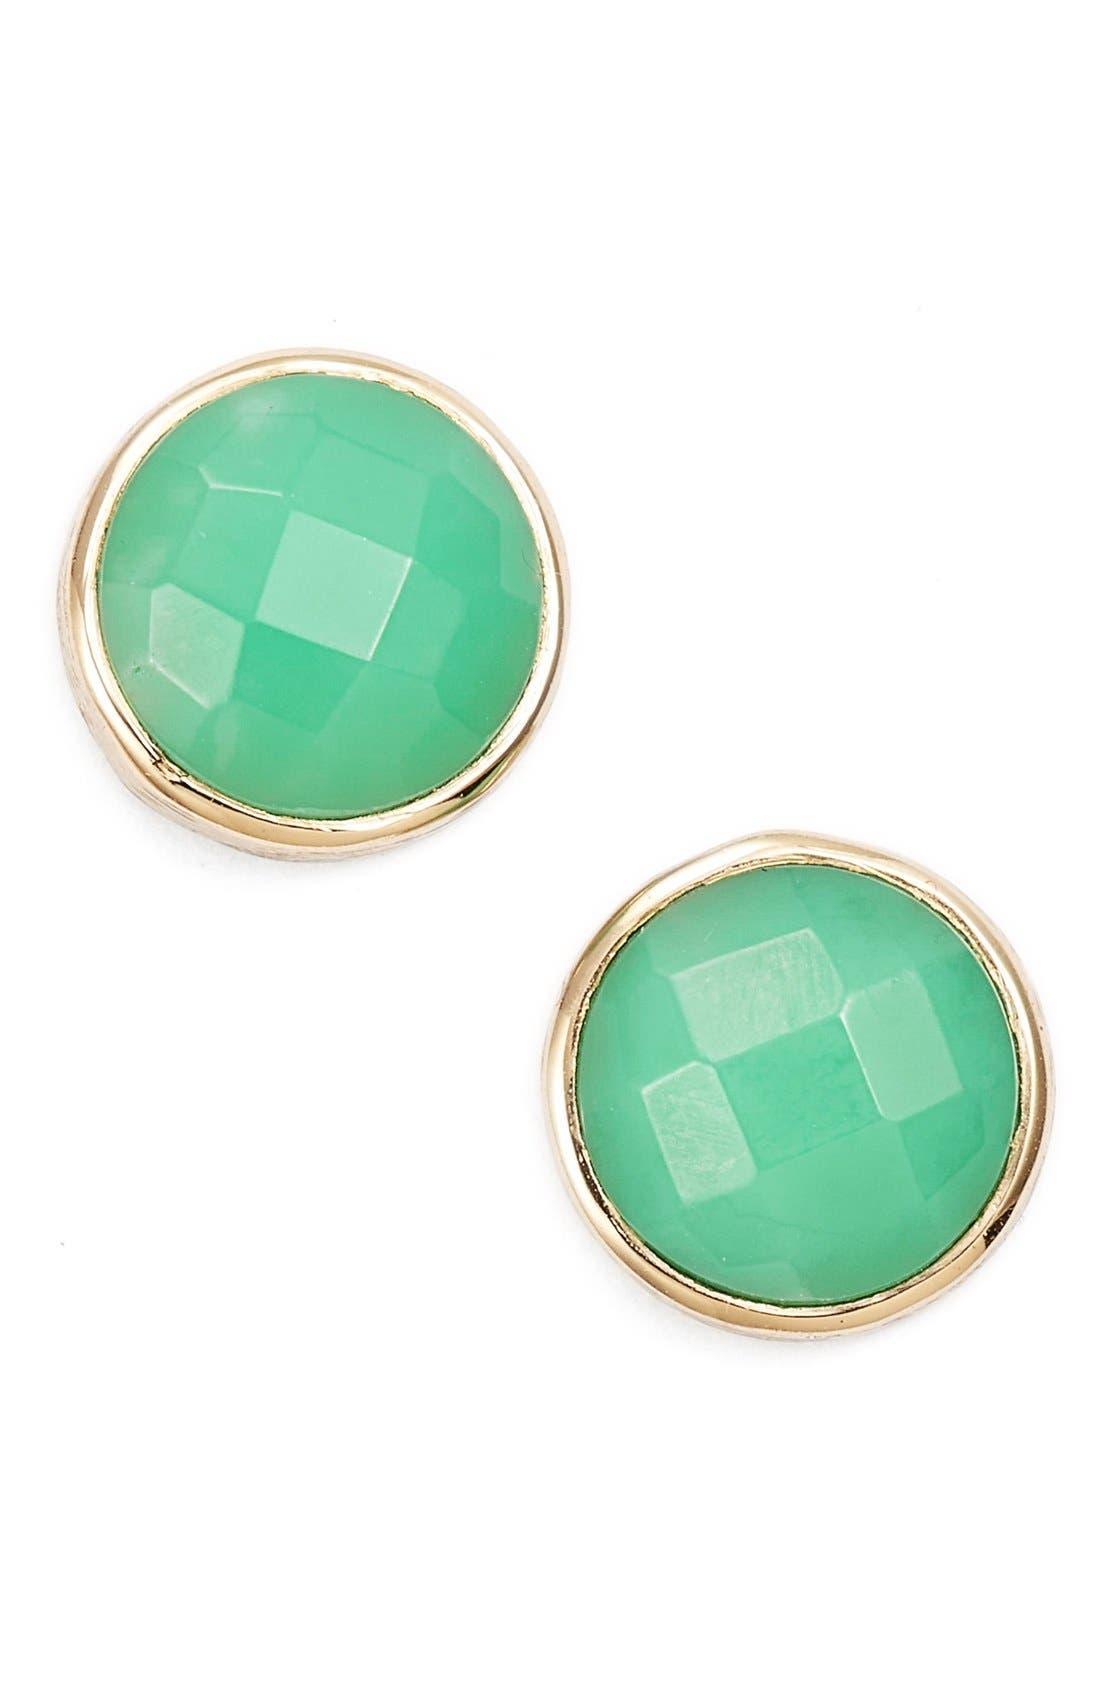 Alternate Image 1 Selected - Melinda Maria 'Hunter' Stud Earrings